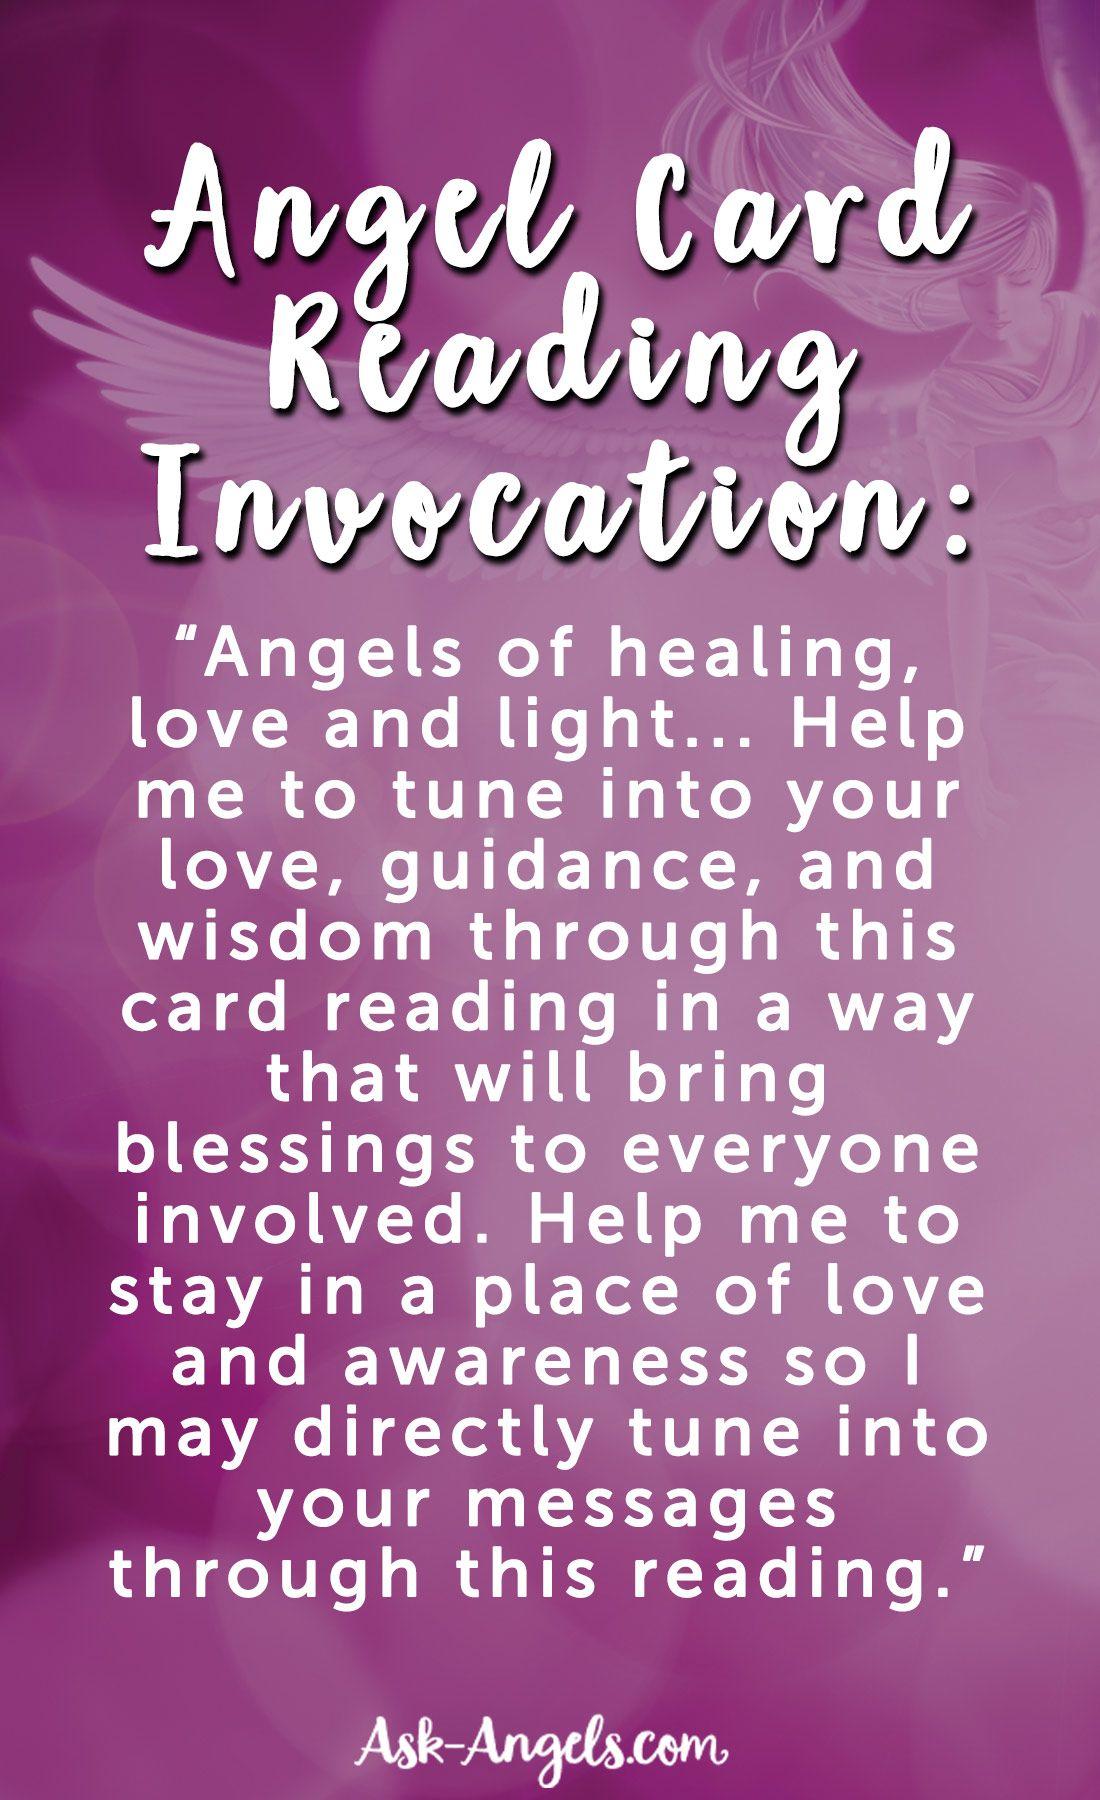 Angel Cards Get Free Angel Card Readings On This App Angel Cards Card Reading Angel Cards Reading